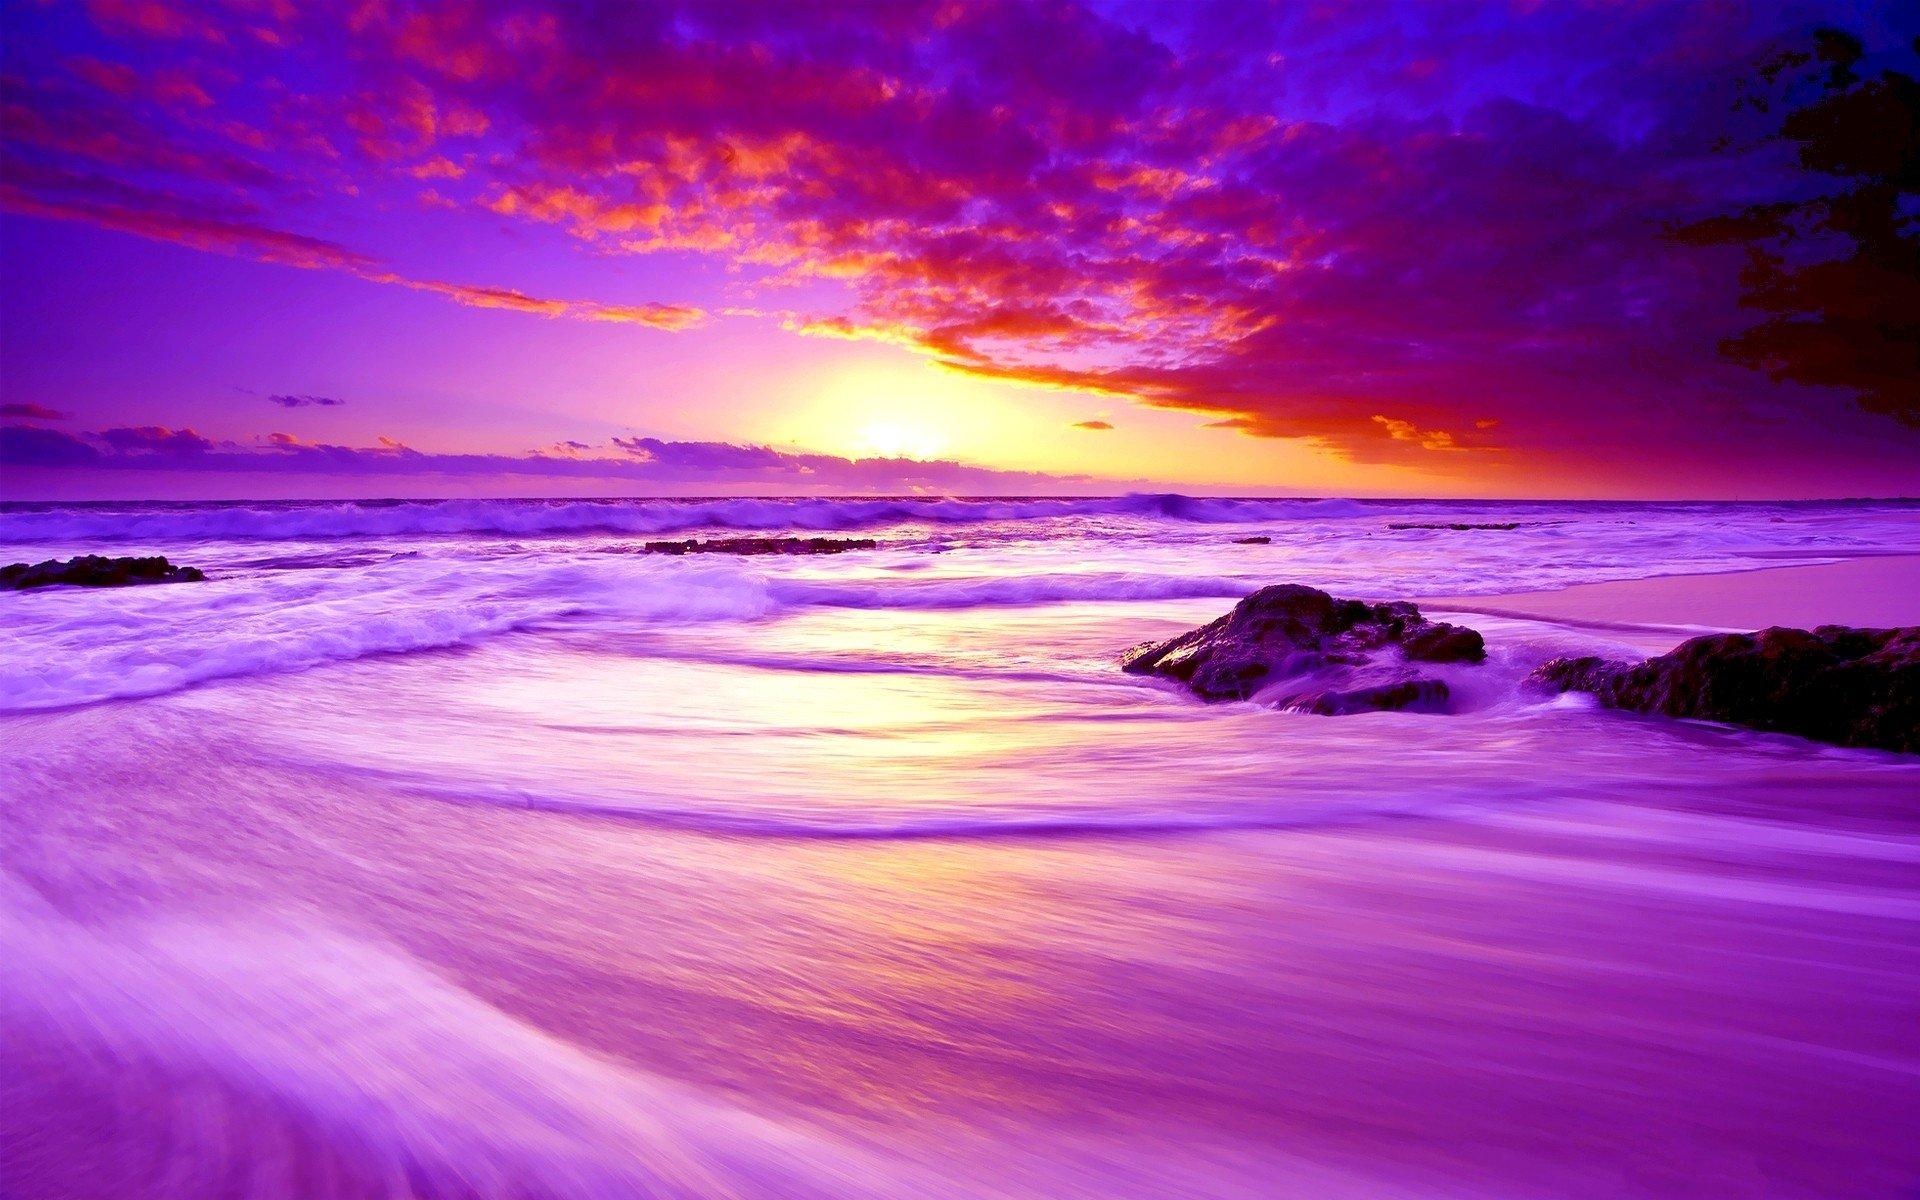 Fondo De Pantalla 1920x1200 Id: Purple Beach Sunset Fondo De Pantalla HD